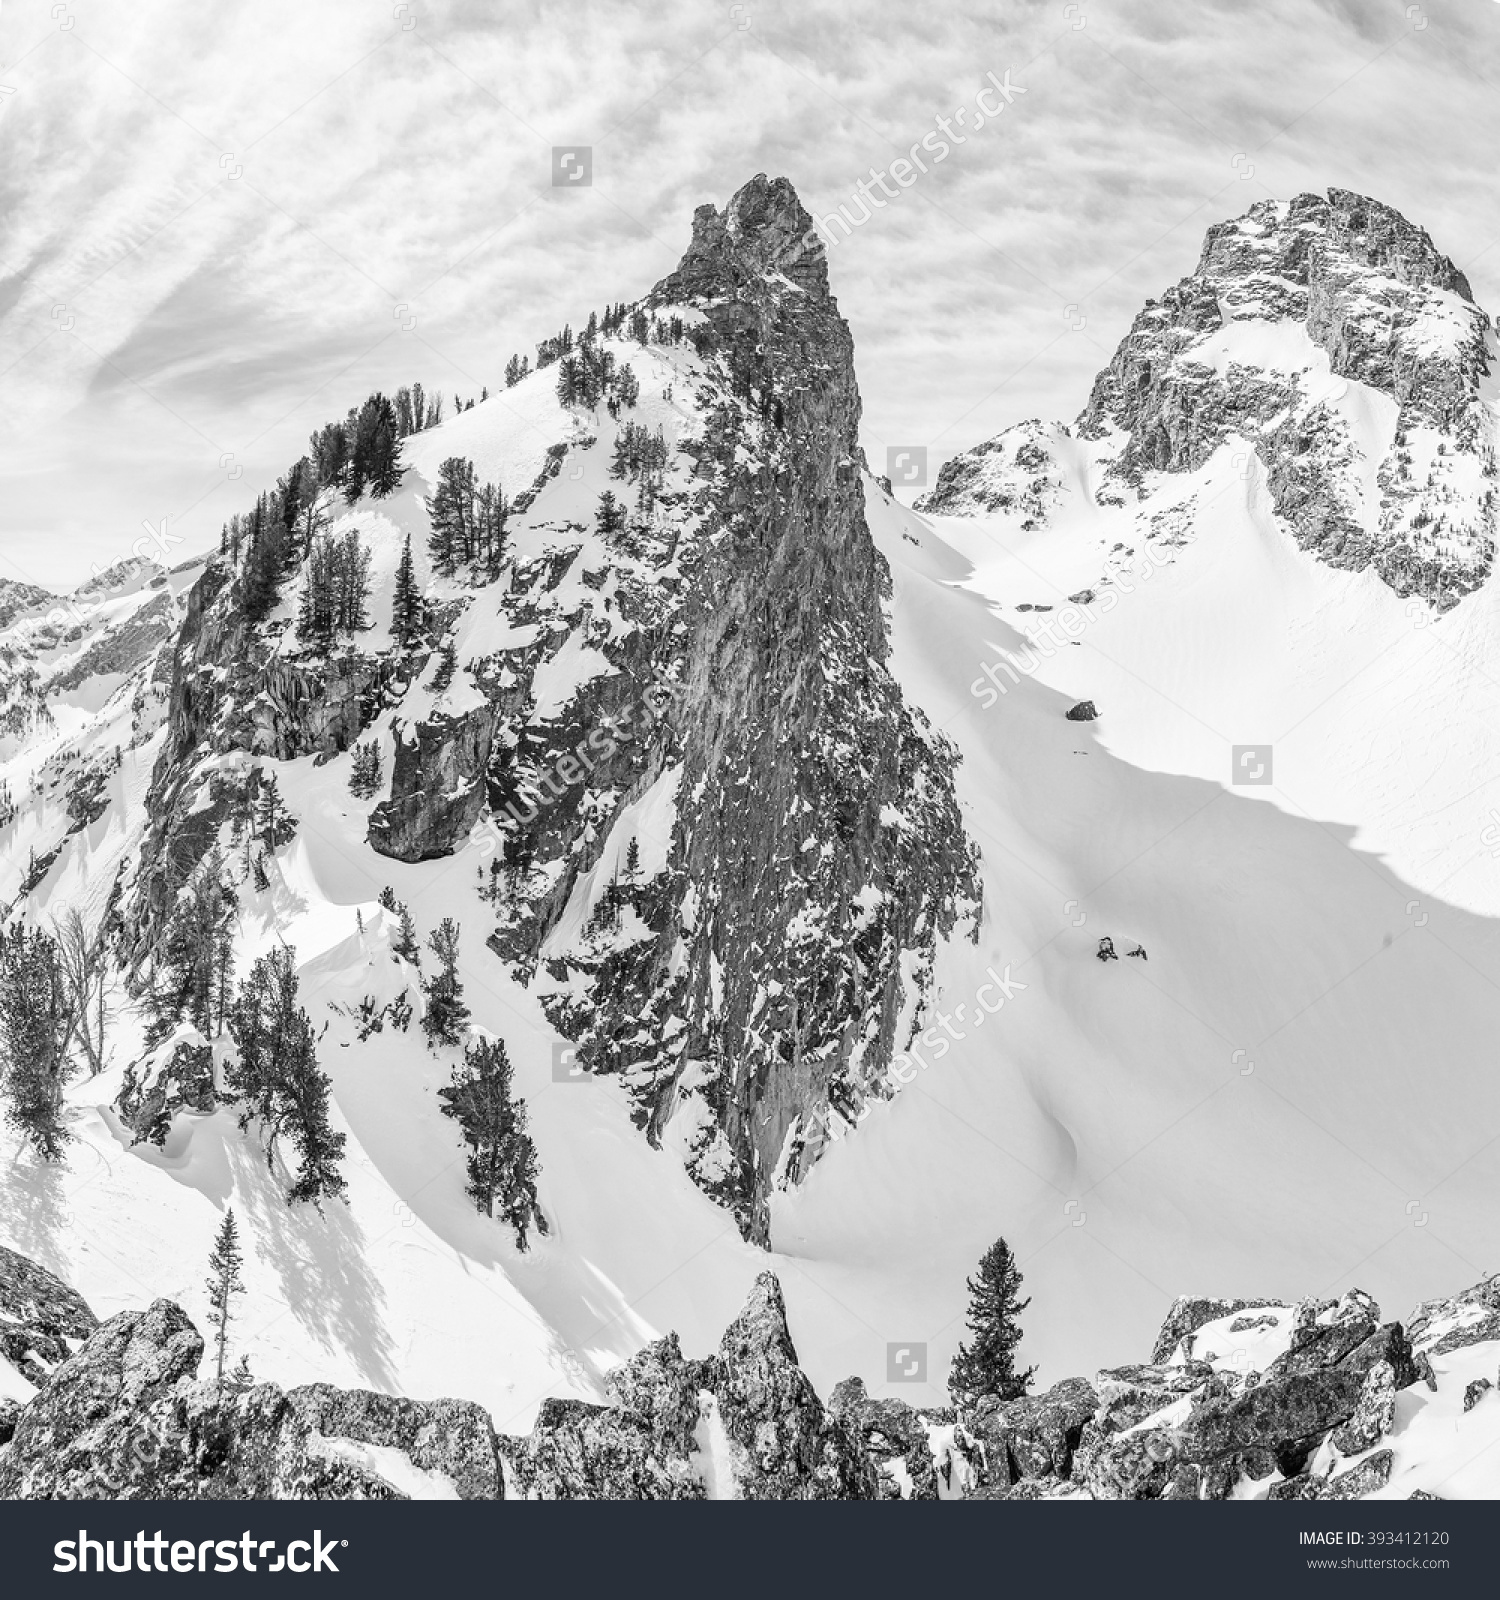 Grand Teton National Park clipart #17, Download drawings